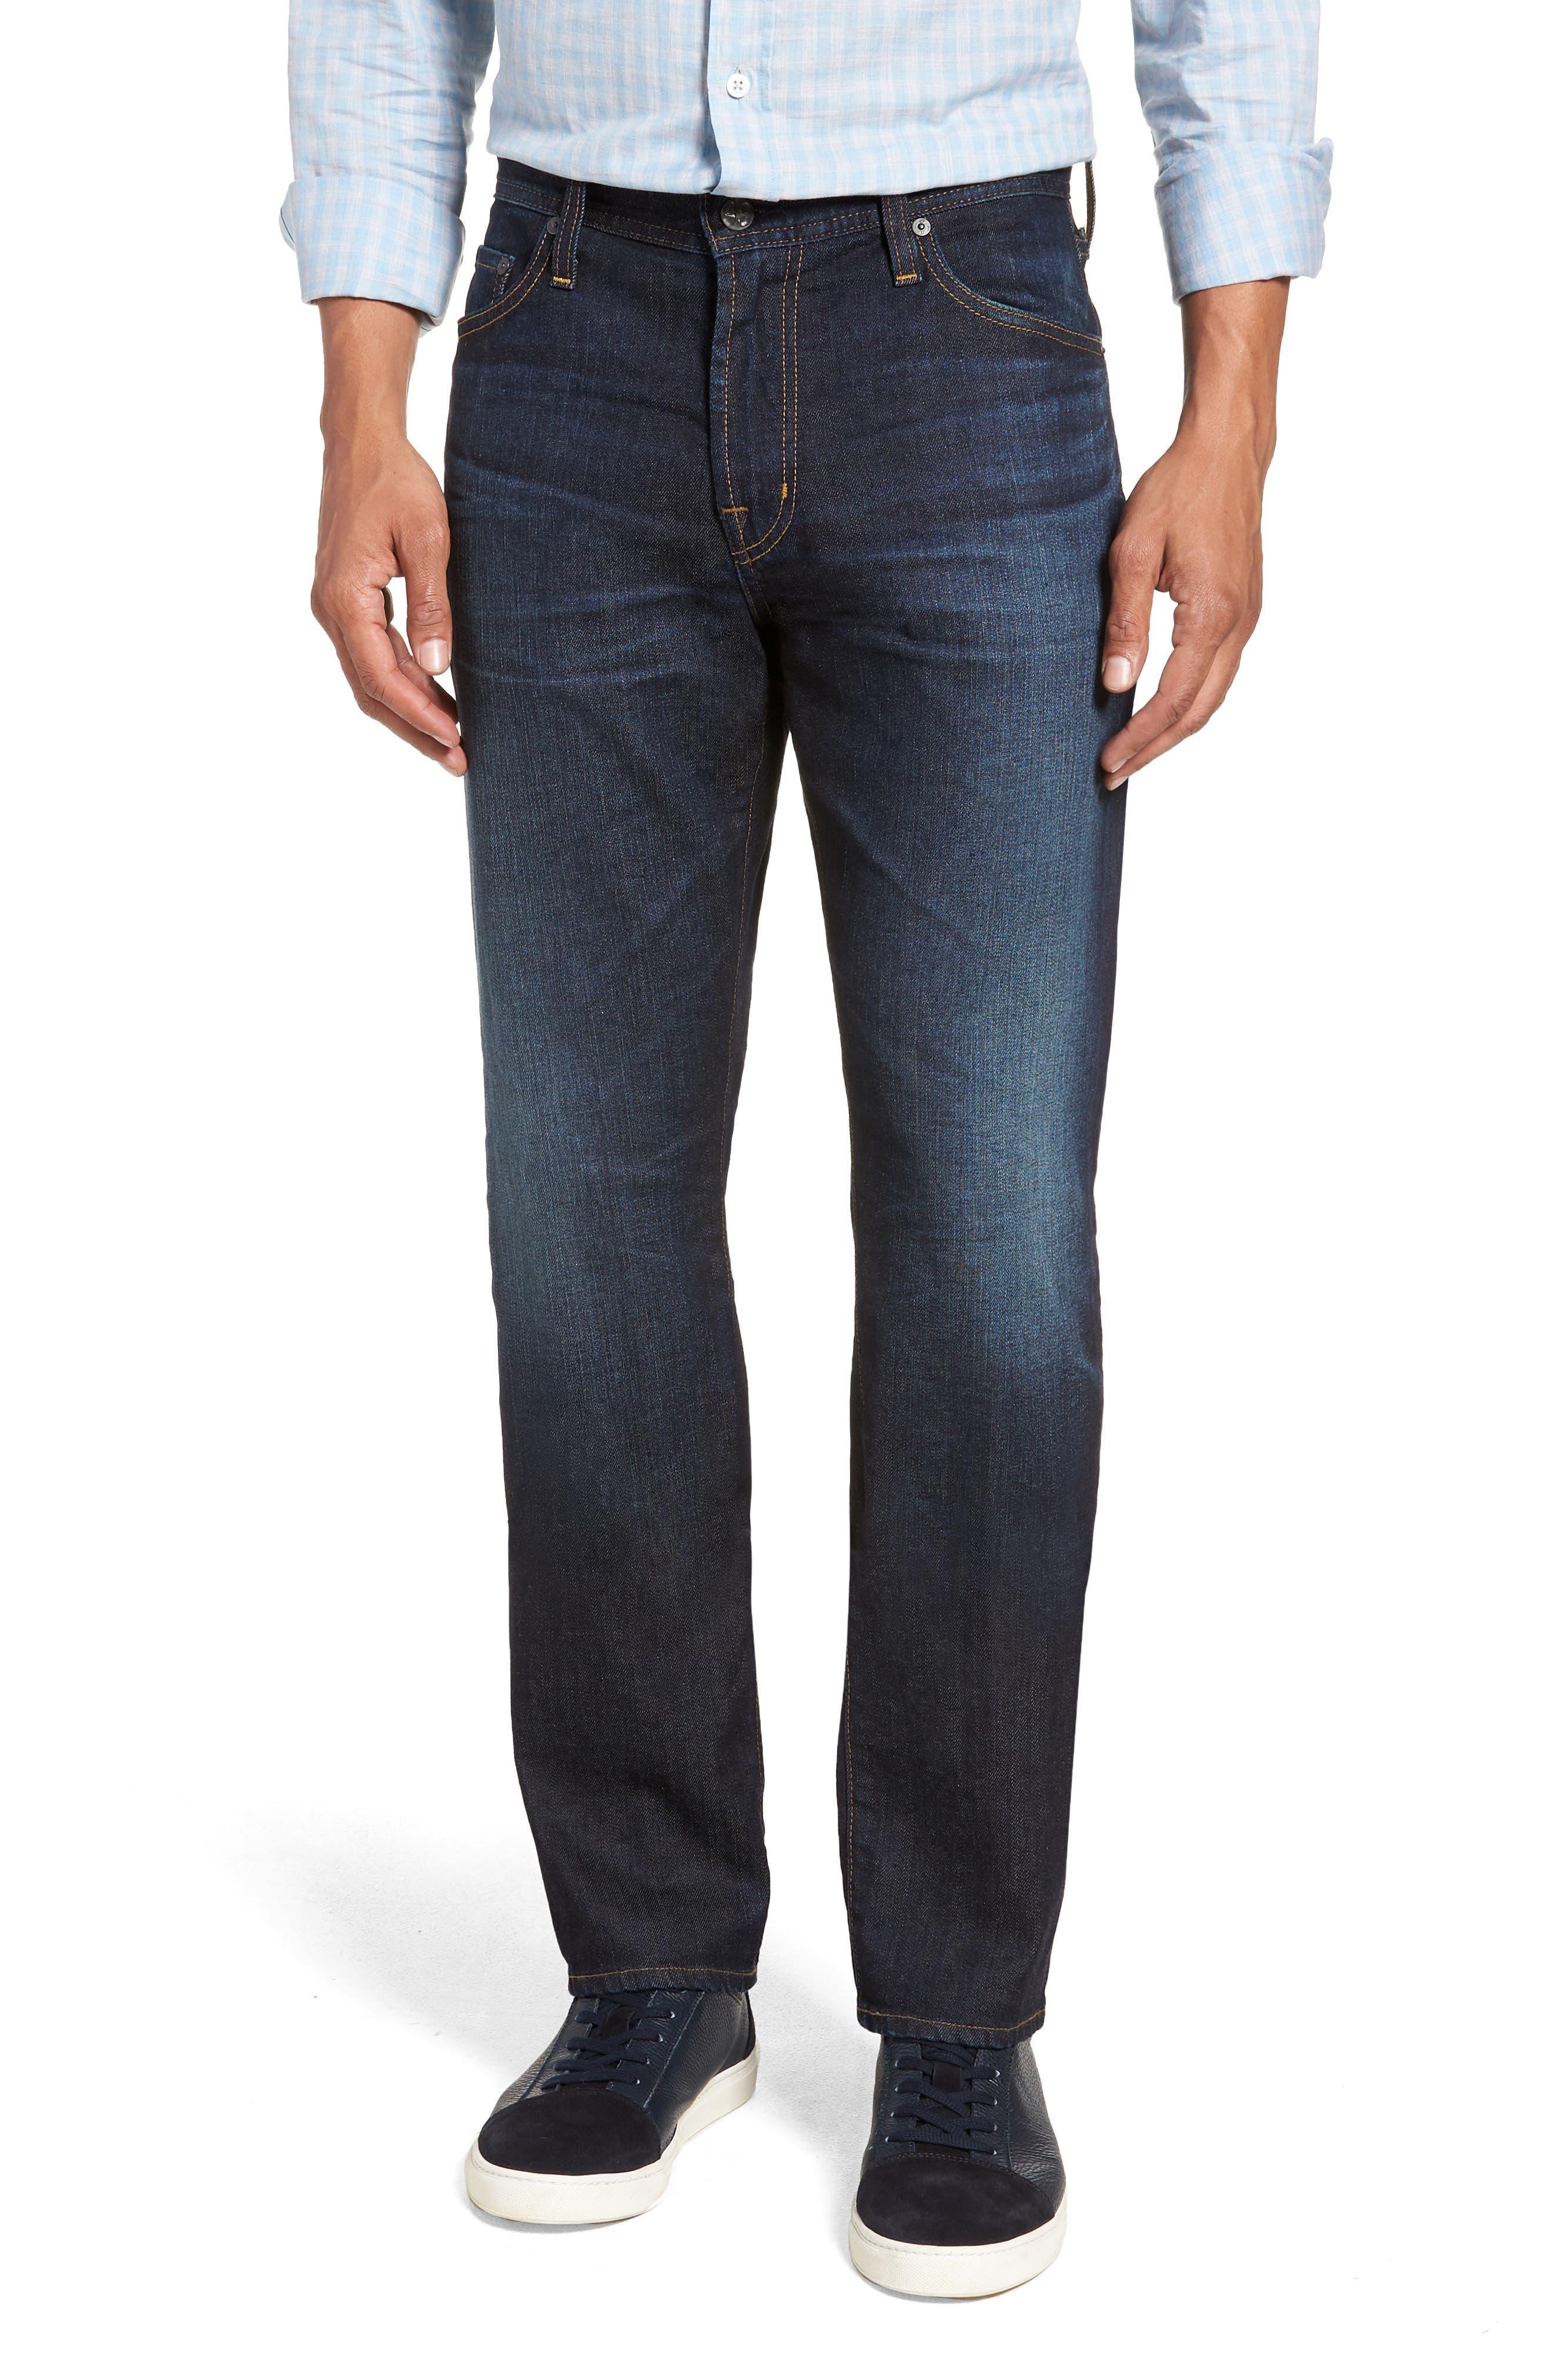 Everett Slim Straight Leg Jeans,                         Main,                         color, 5 YEARS CASINO